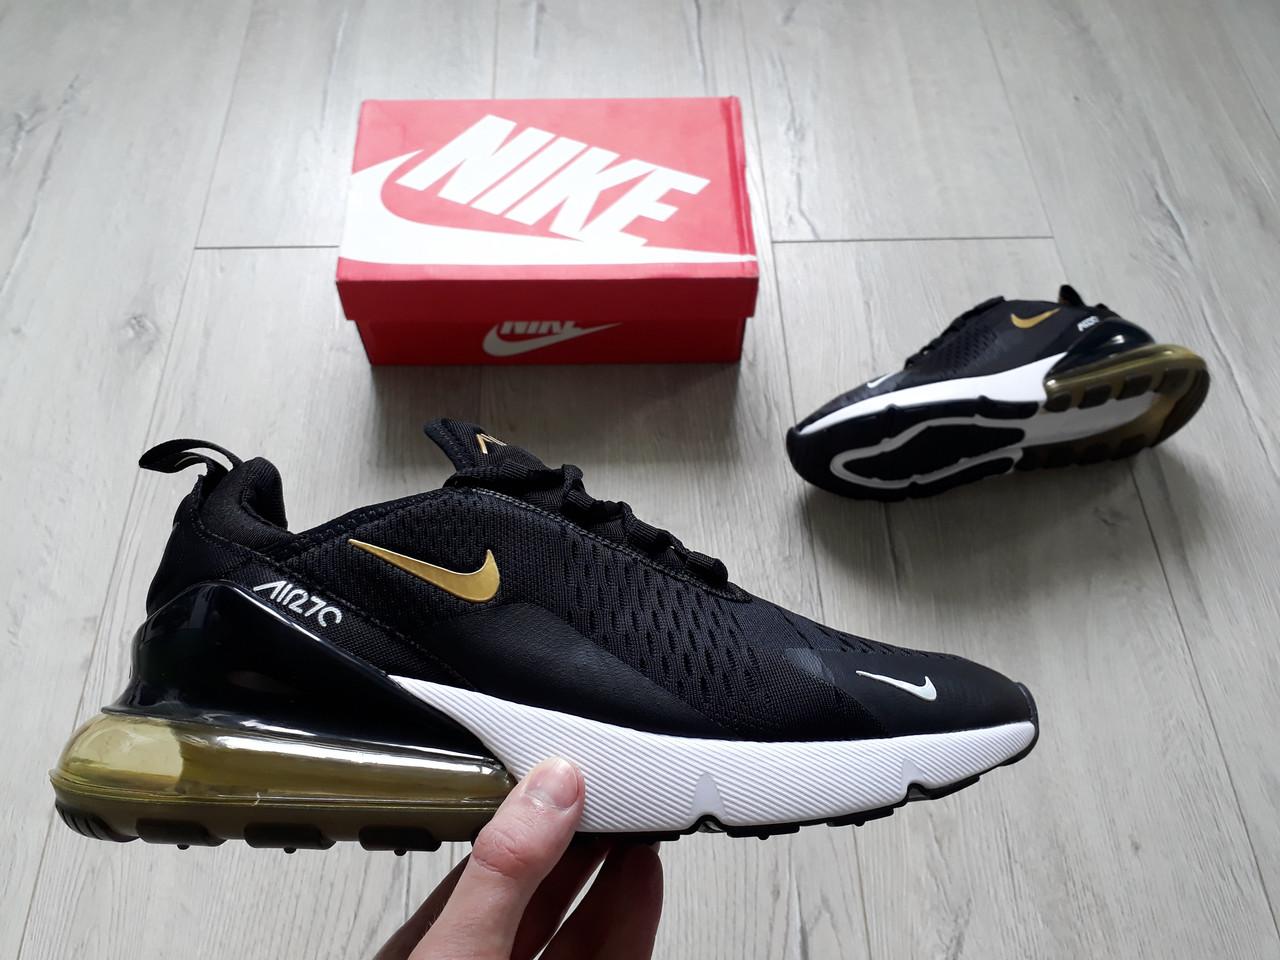 8bd6f456182a46 Мужские кроссовки Nike Air Max 270 Black/Gold редкая золотая расцветка,  много цветов в